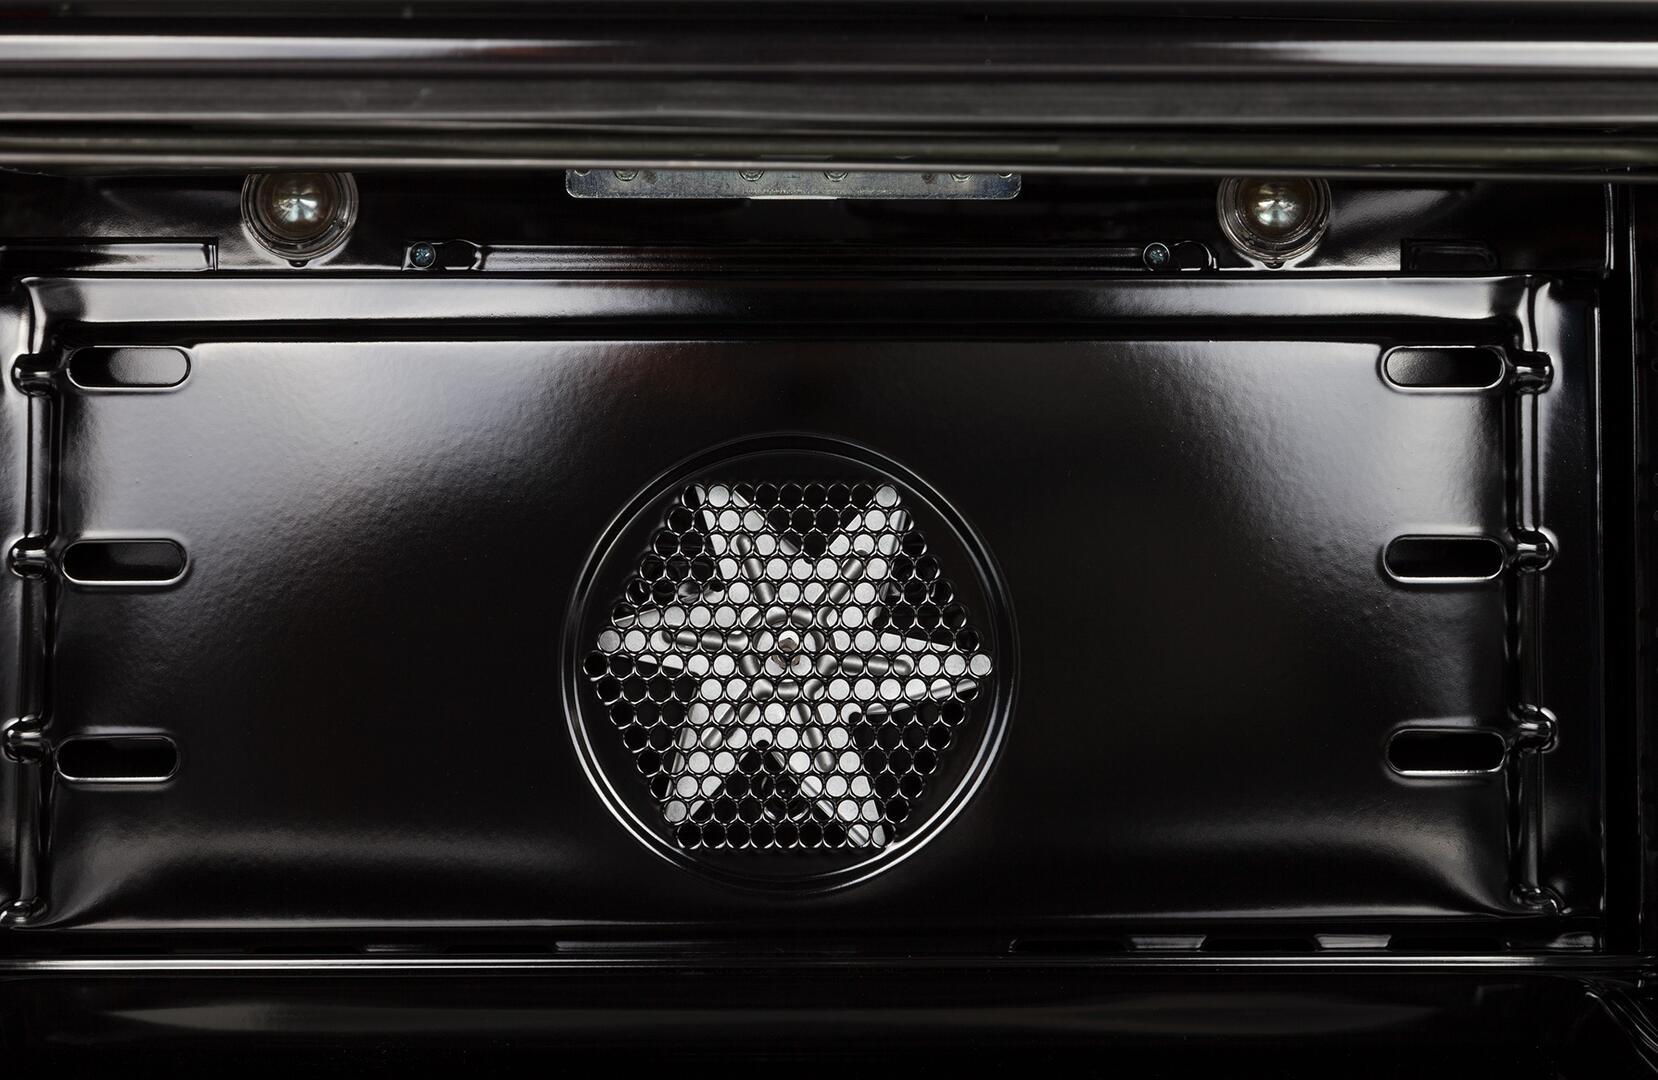 Ilve Professional Plus UPW76DMPBLP Freestanding Dual Fuel Range White, 6